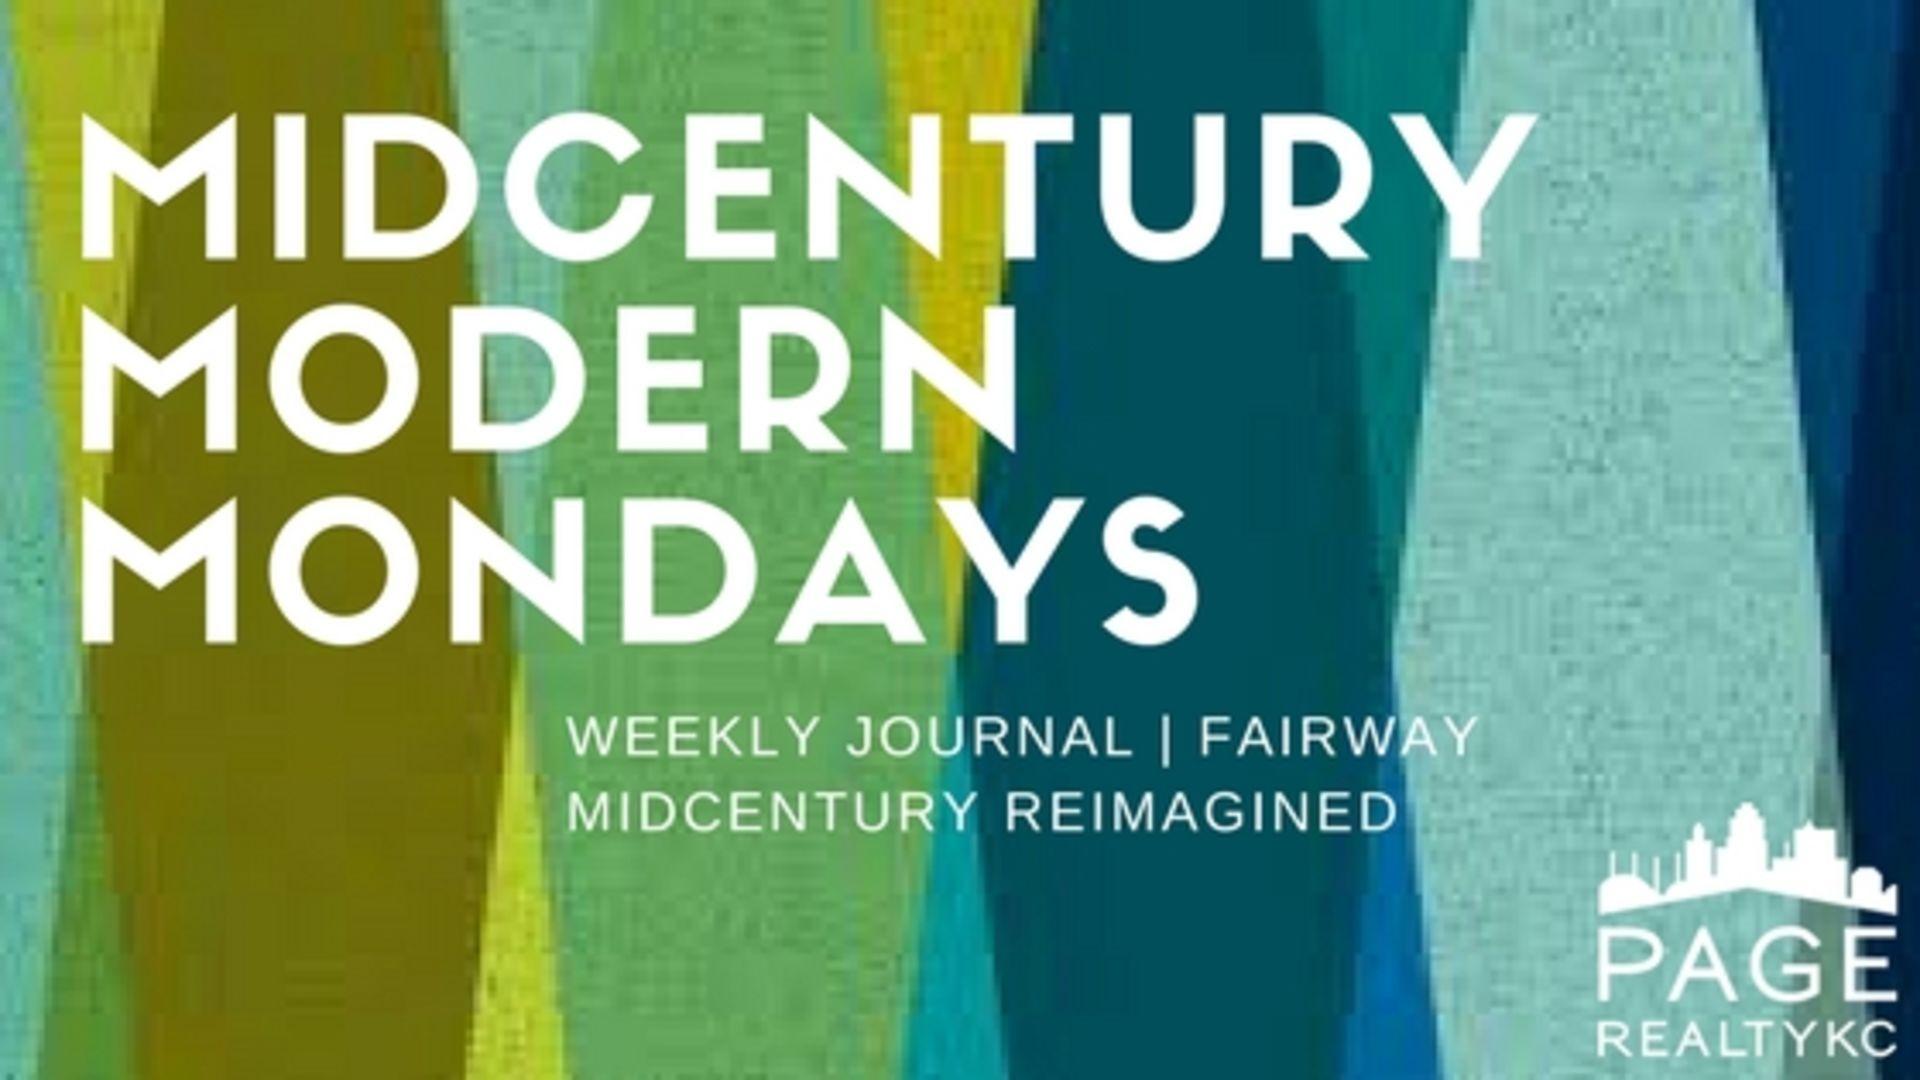 Midcentury Modern Monday July 17th